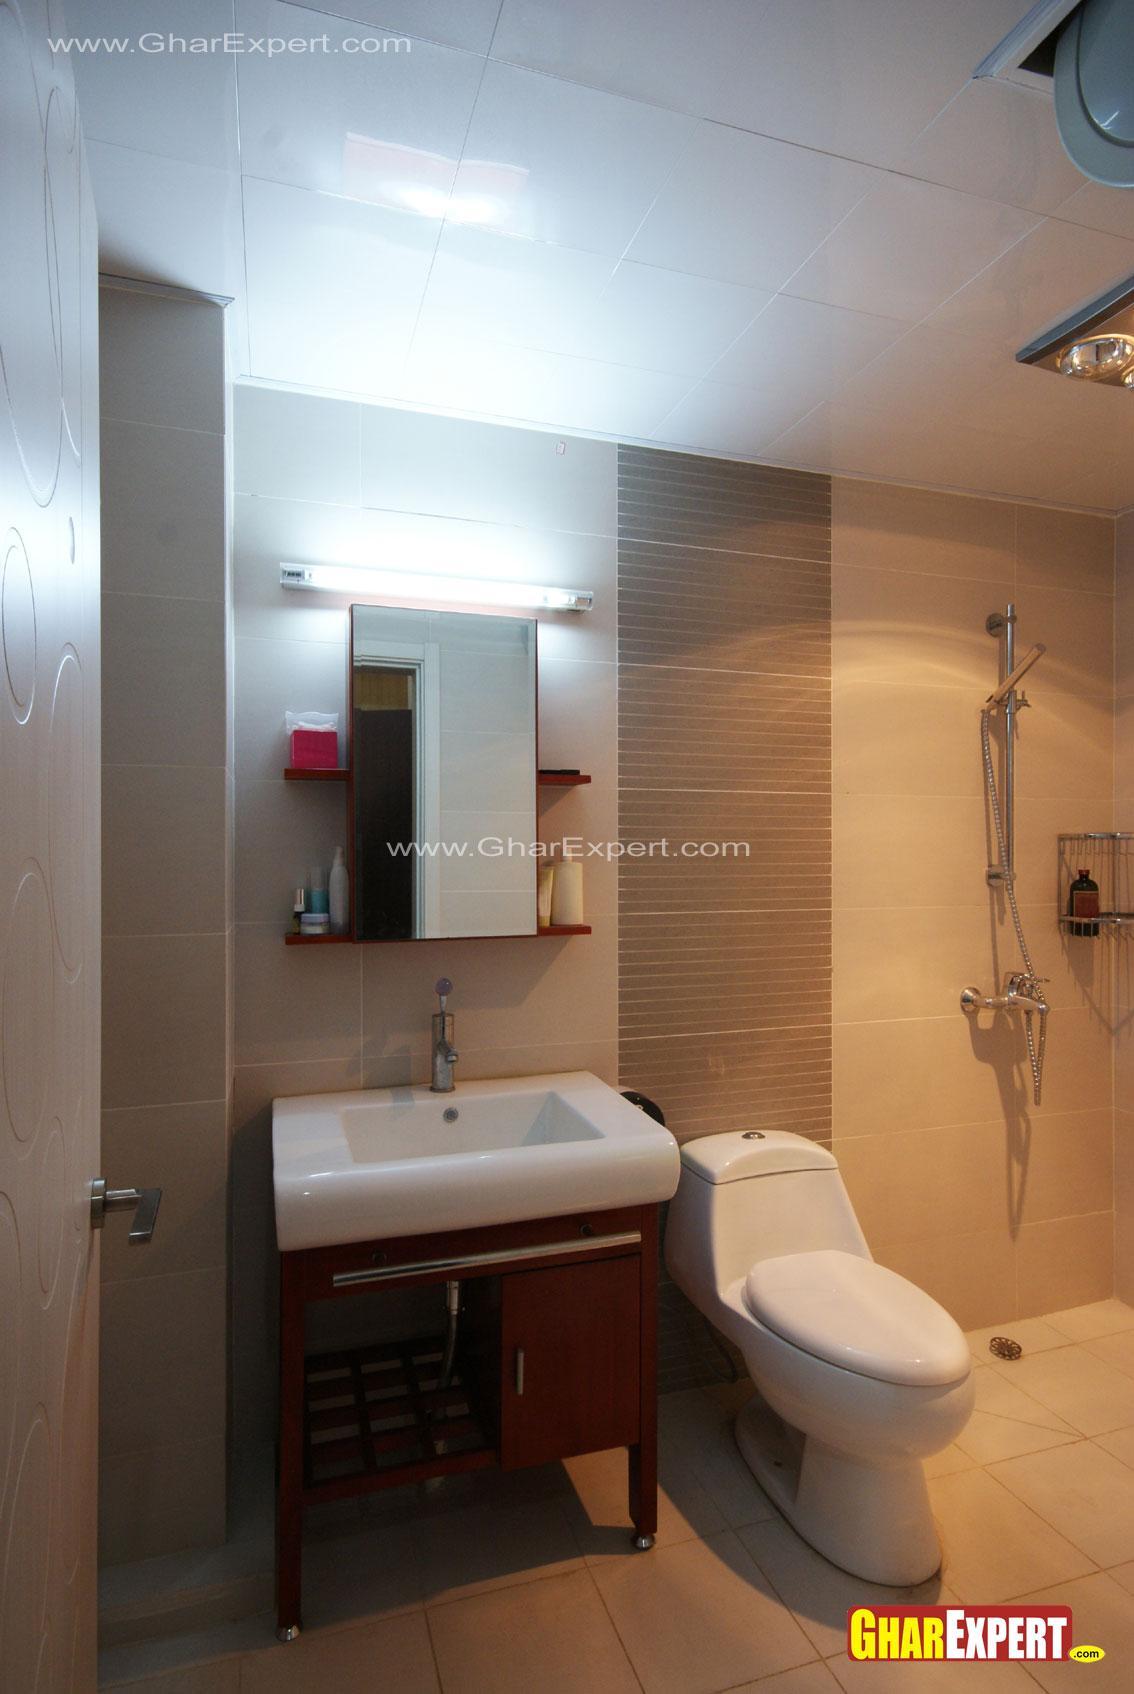 Bathroom Designs Indian Apartments indian simple bathroom tiles bathroom designs india bathroom designs